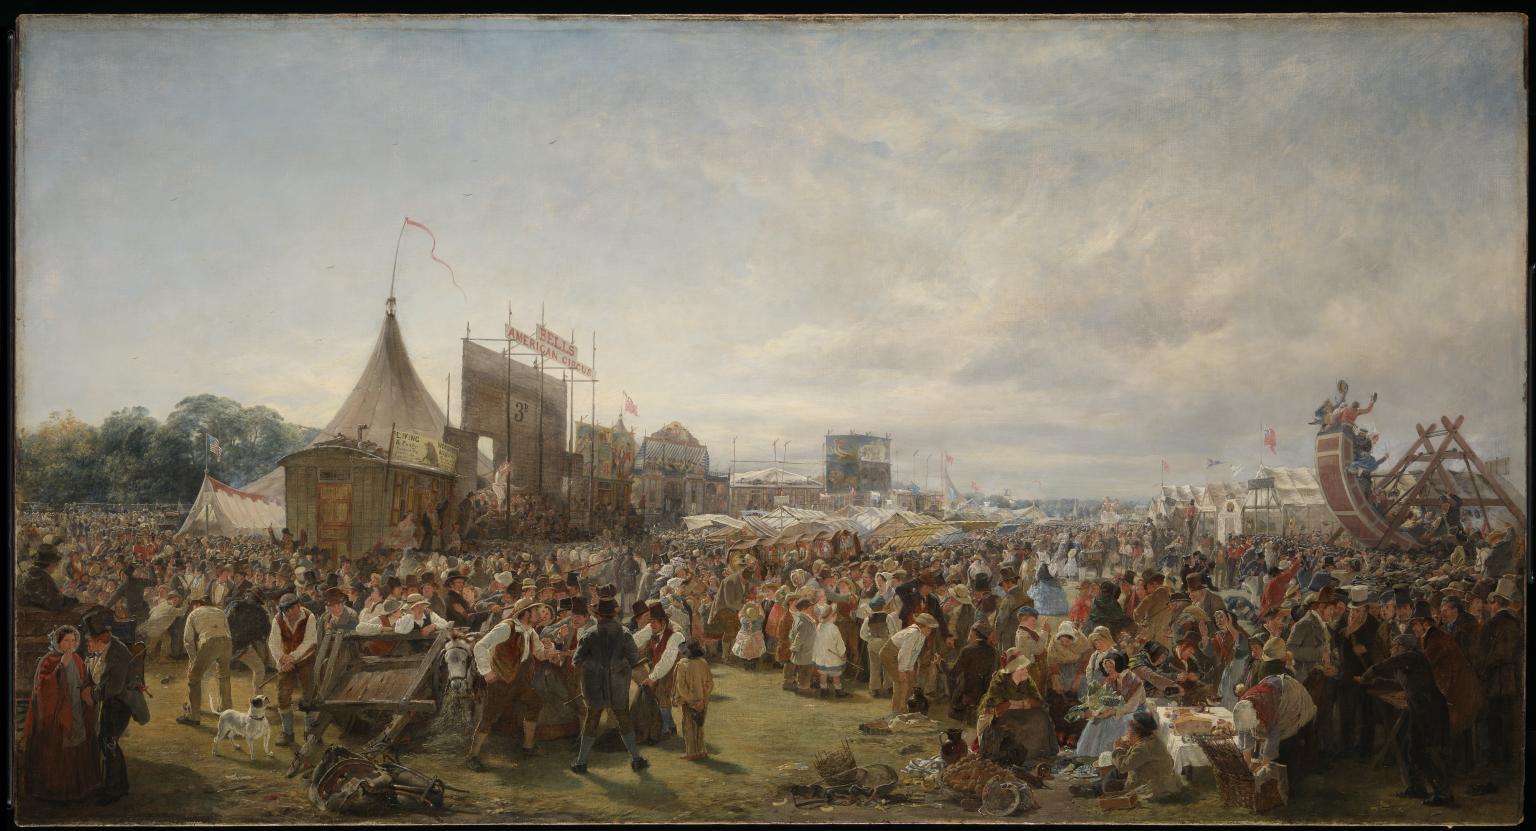 Donnybrook Fair 1859 by Erskine Nicol 1825-1904